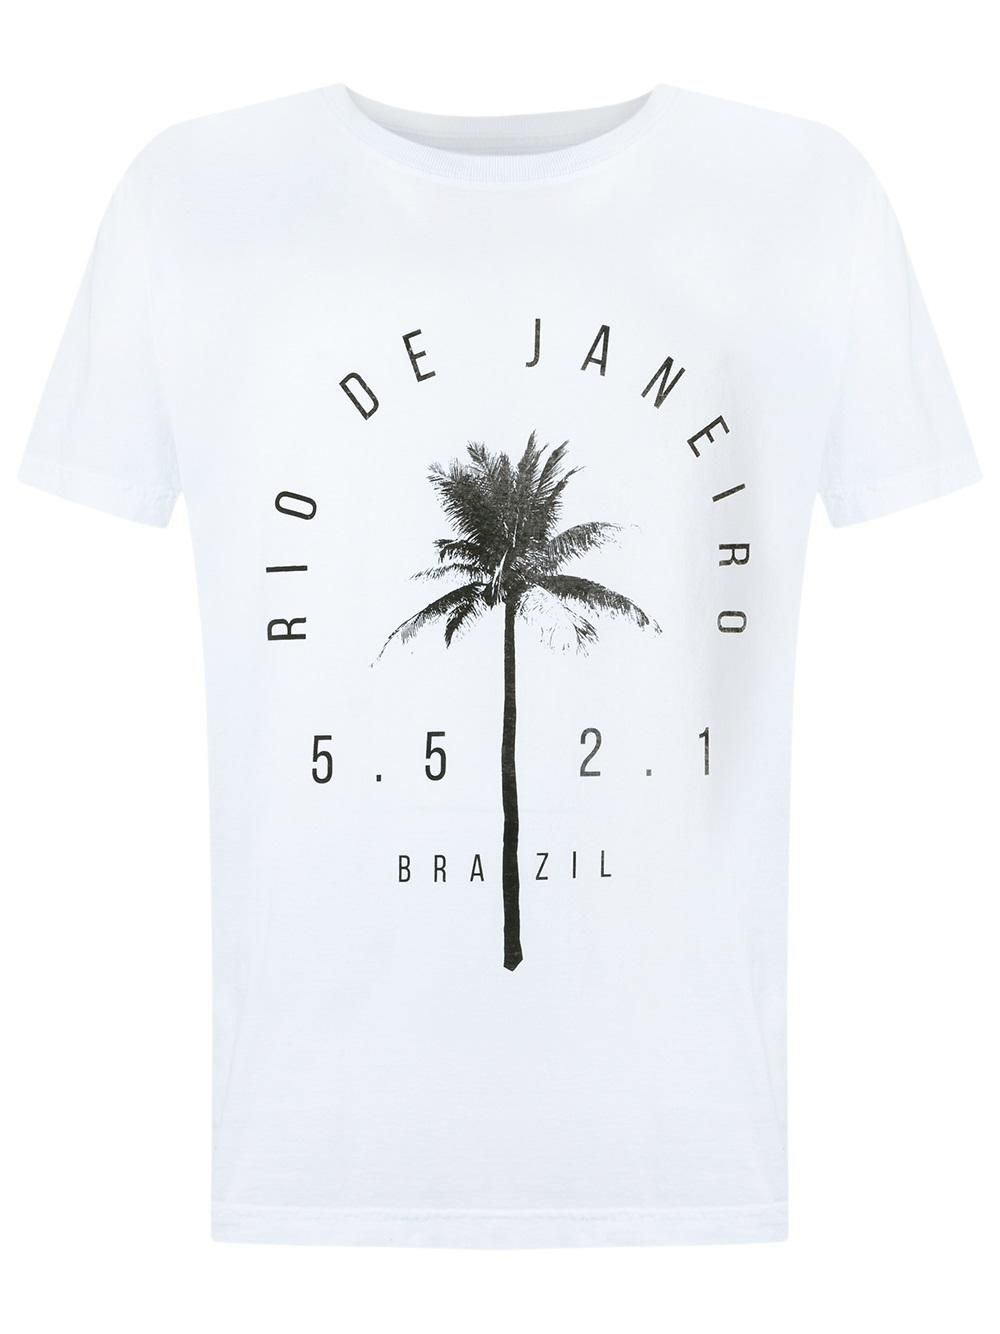 Osklen Camiseta com estampa | Camiseta osklen, Camisas